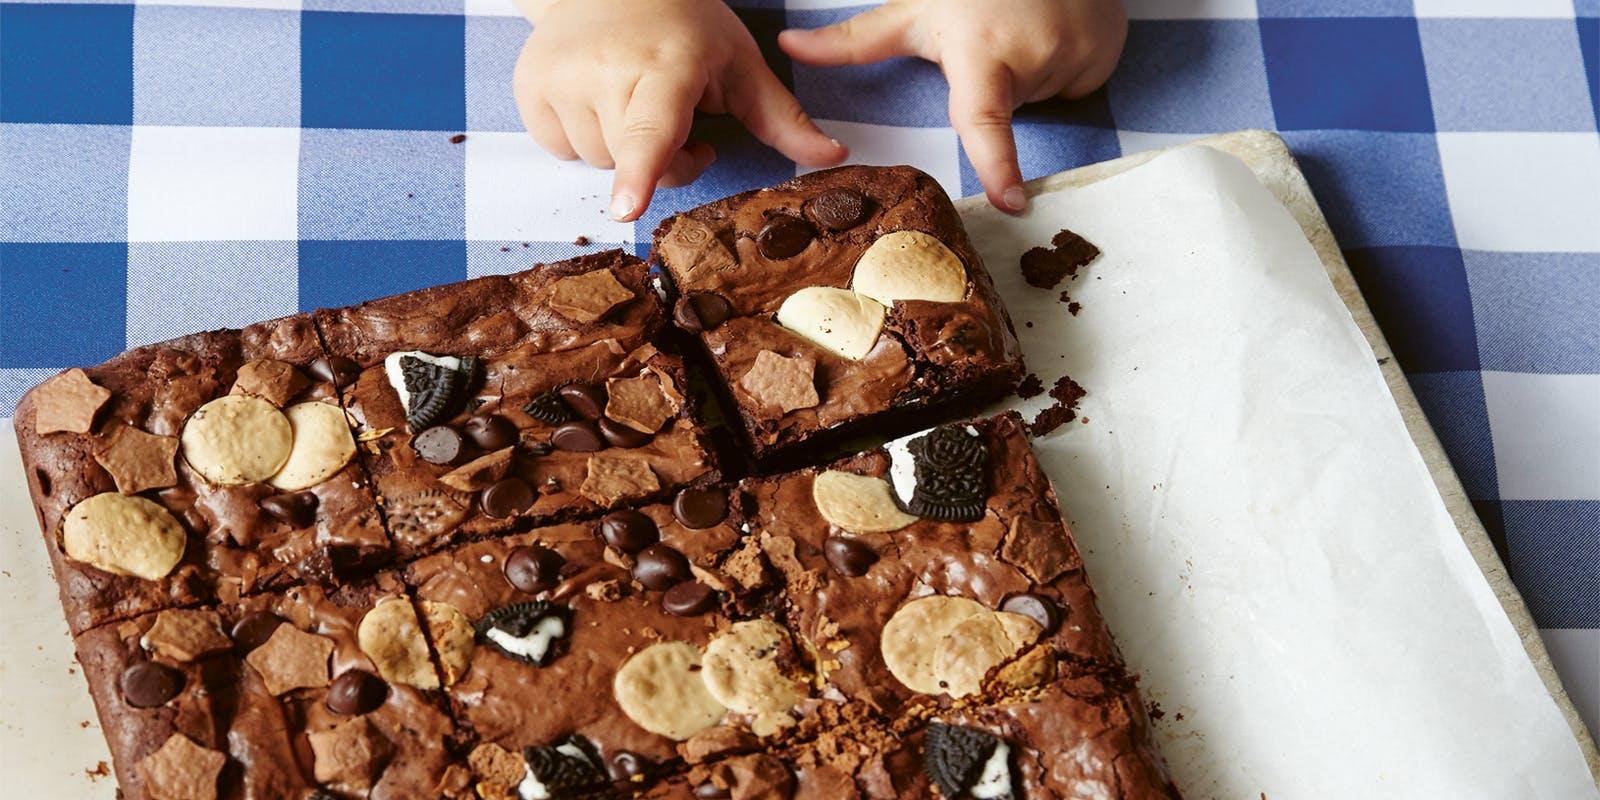 'Triple threat' chocolate brownies